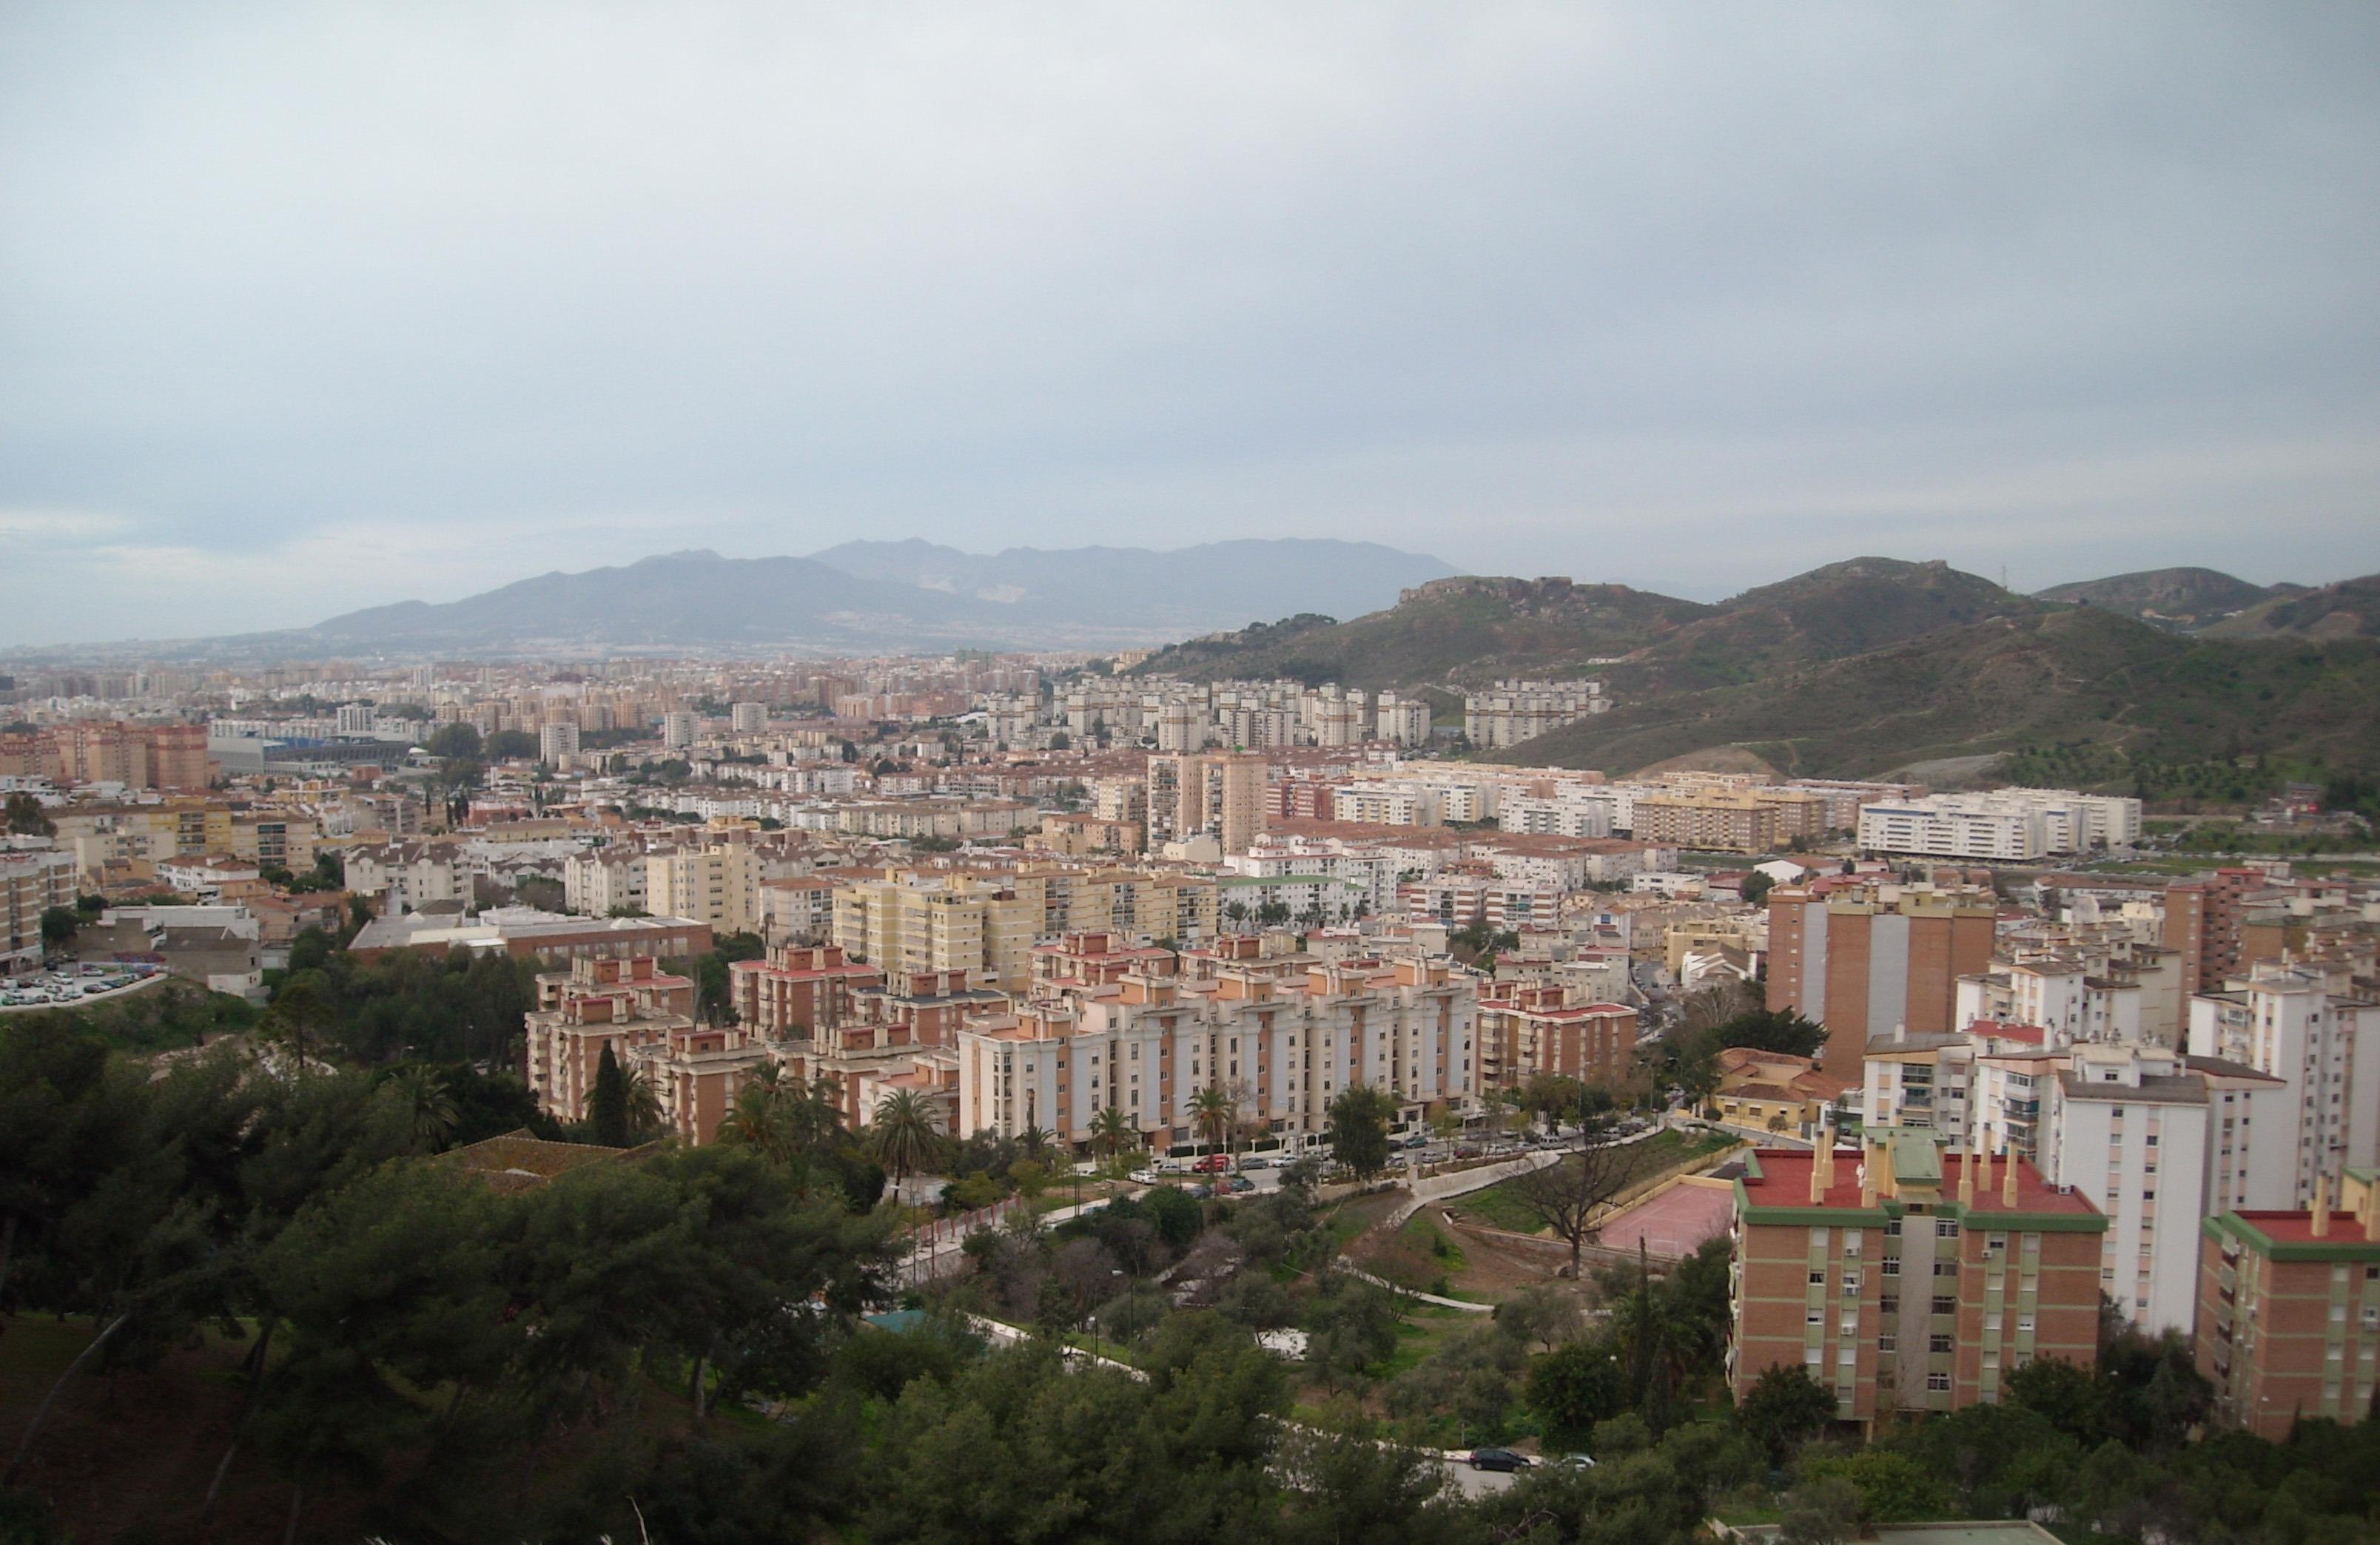 Fotos gratis horizonte pueblo ciudad paisaje urbano panorama espa a hogares andaluc a - Fotografia aerea malaga ...